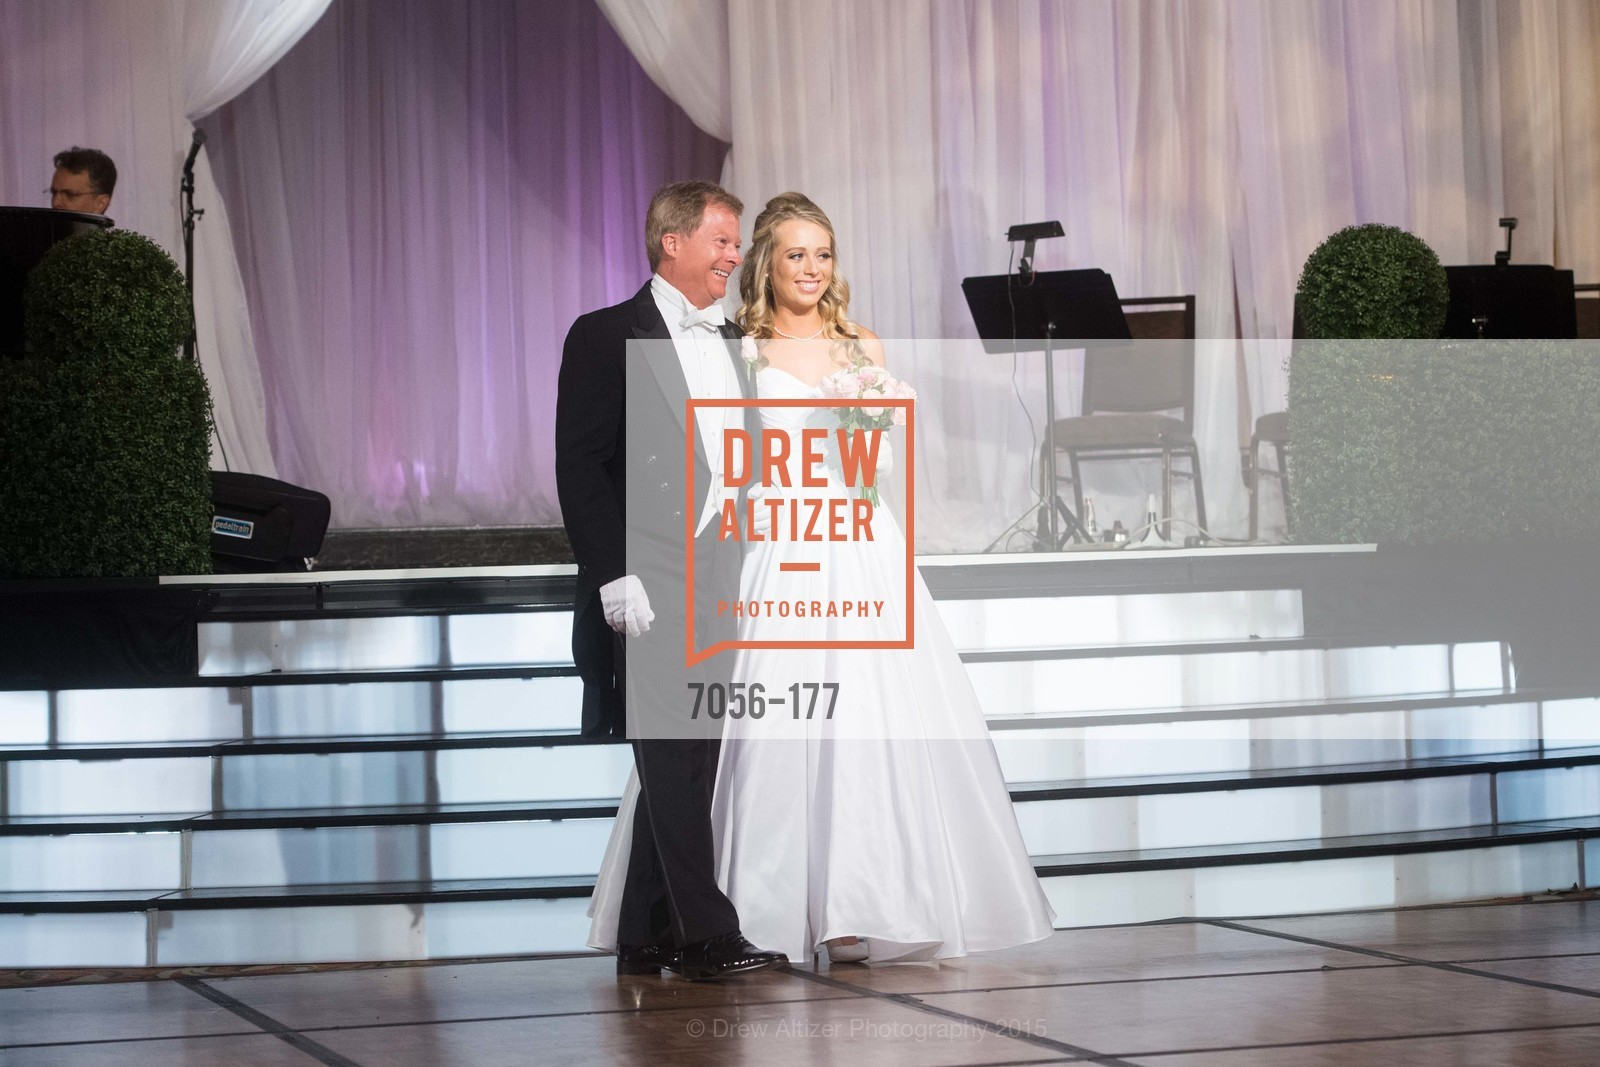 Presentation, The 2015 San Francisco Debutante Ball, June 20th, 2015, Photo,Drew Altizer, Drew Altizer Photography, full-service event agency, private events, San Francisco photographer, photographer California